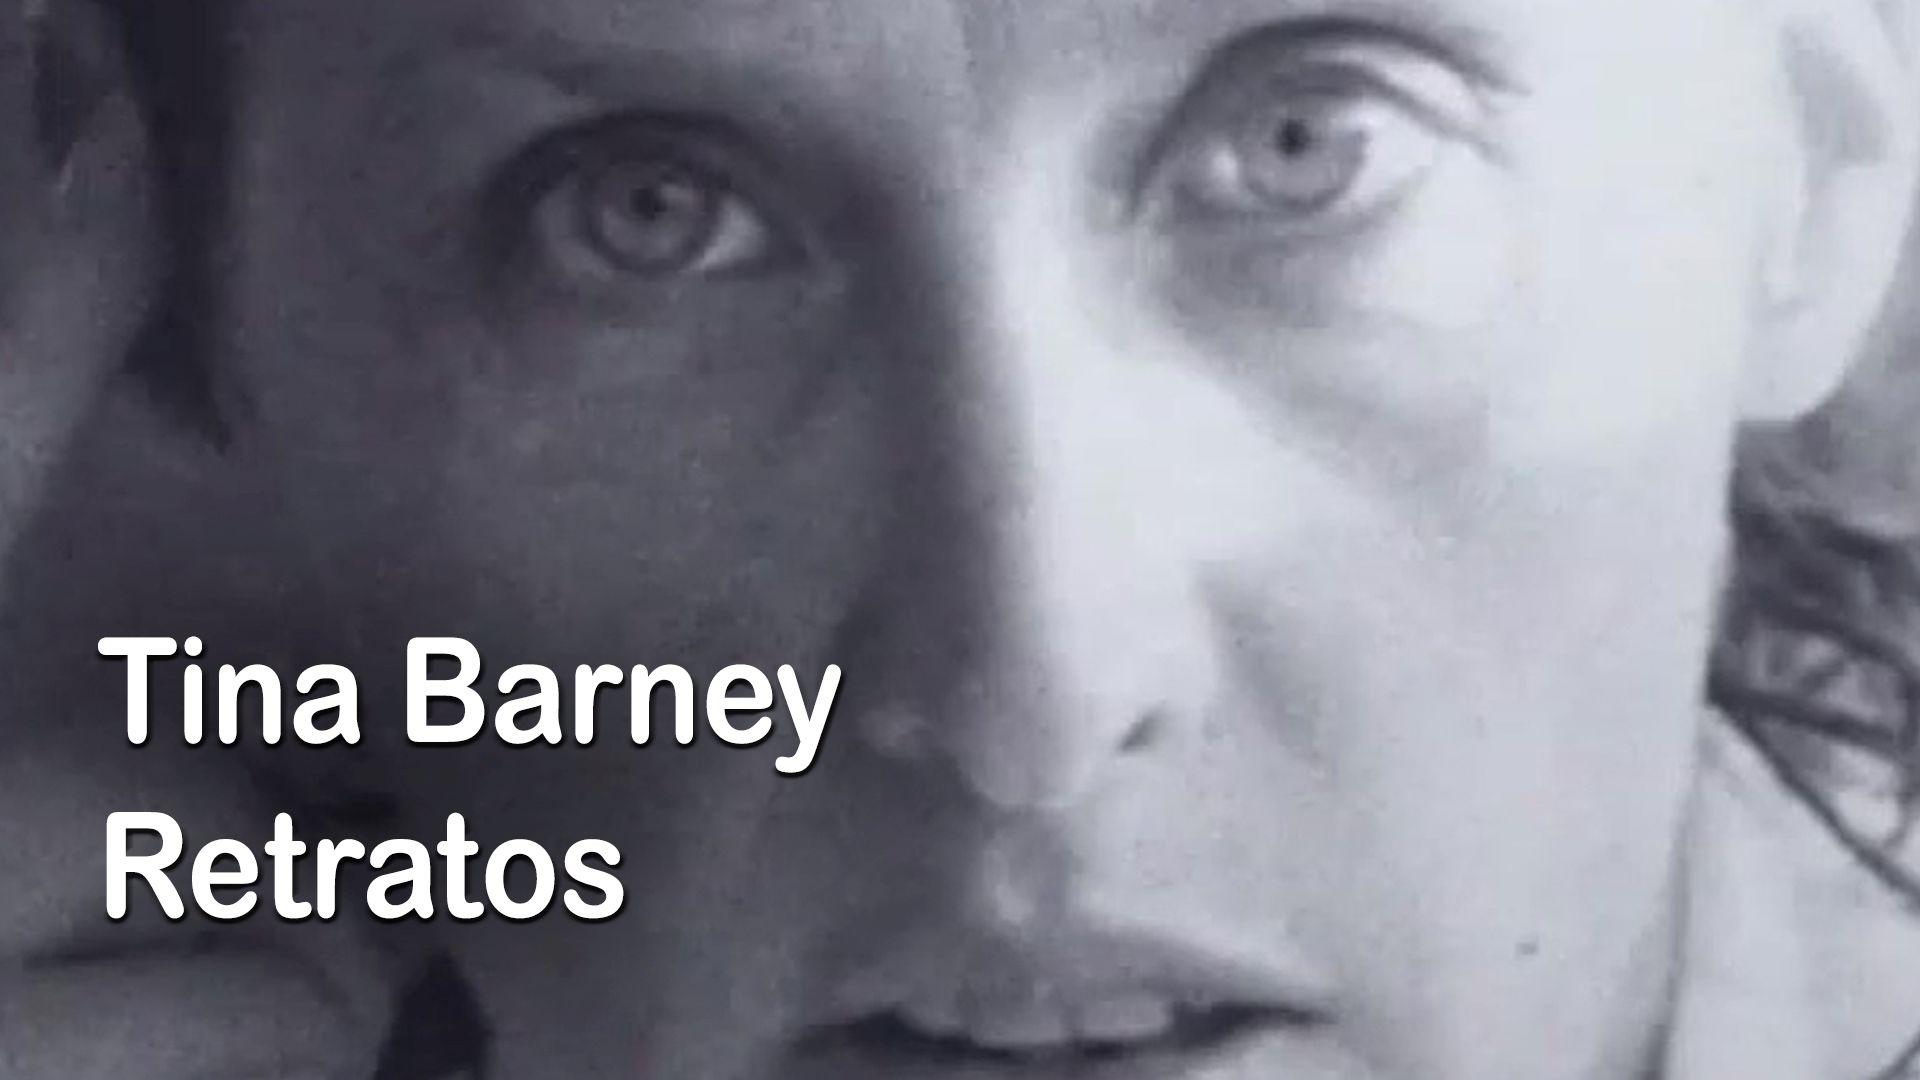 Tina Barney, Retratos